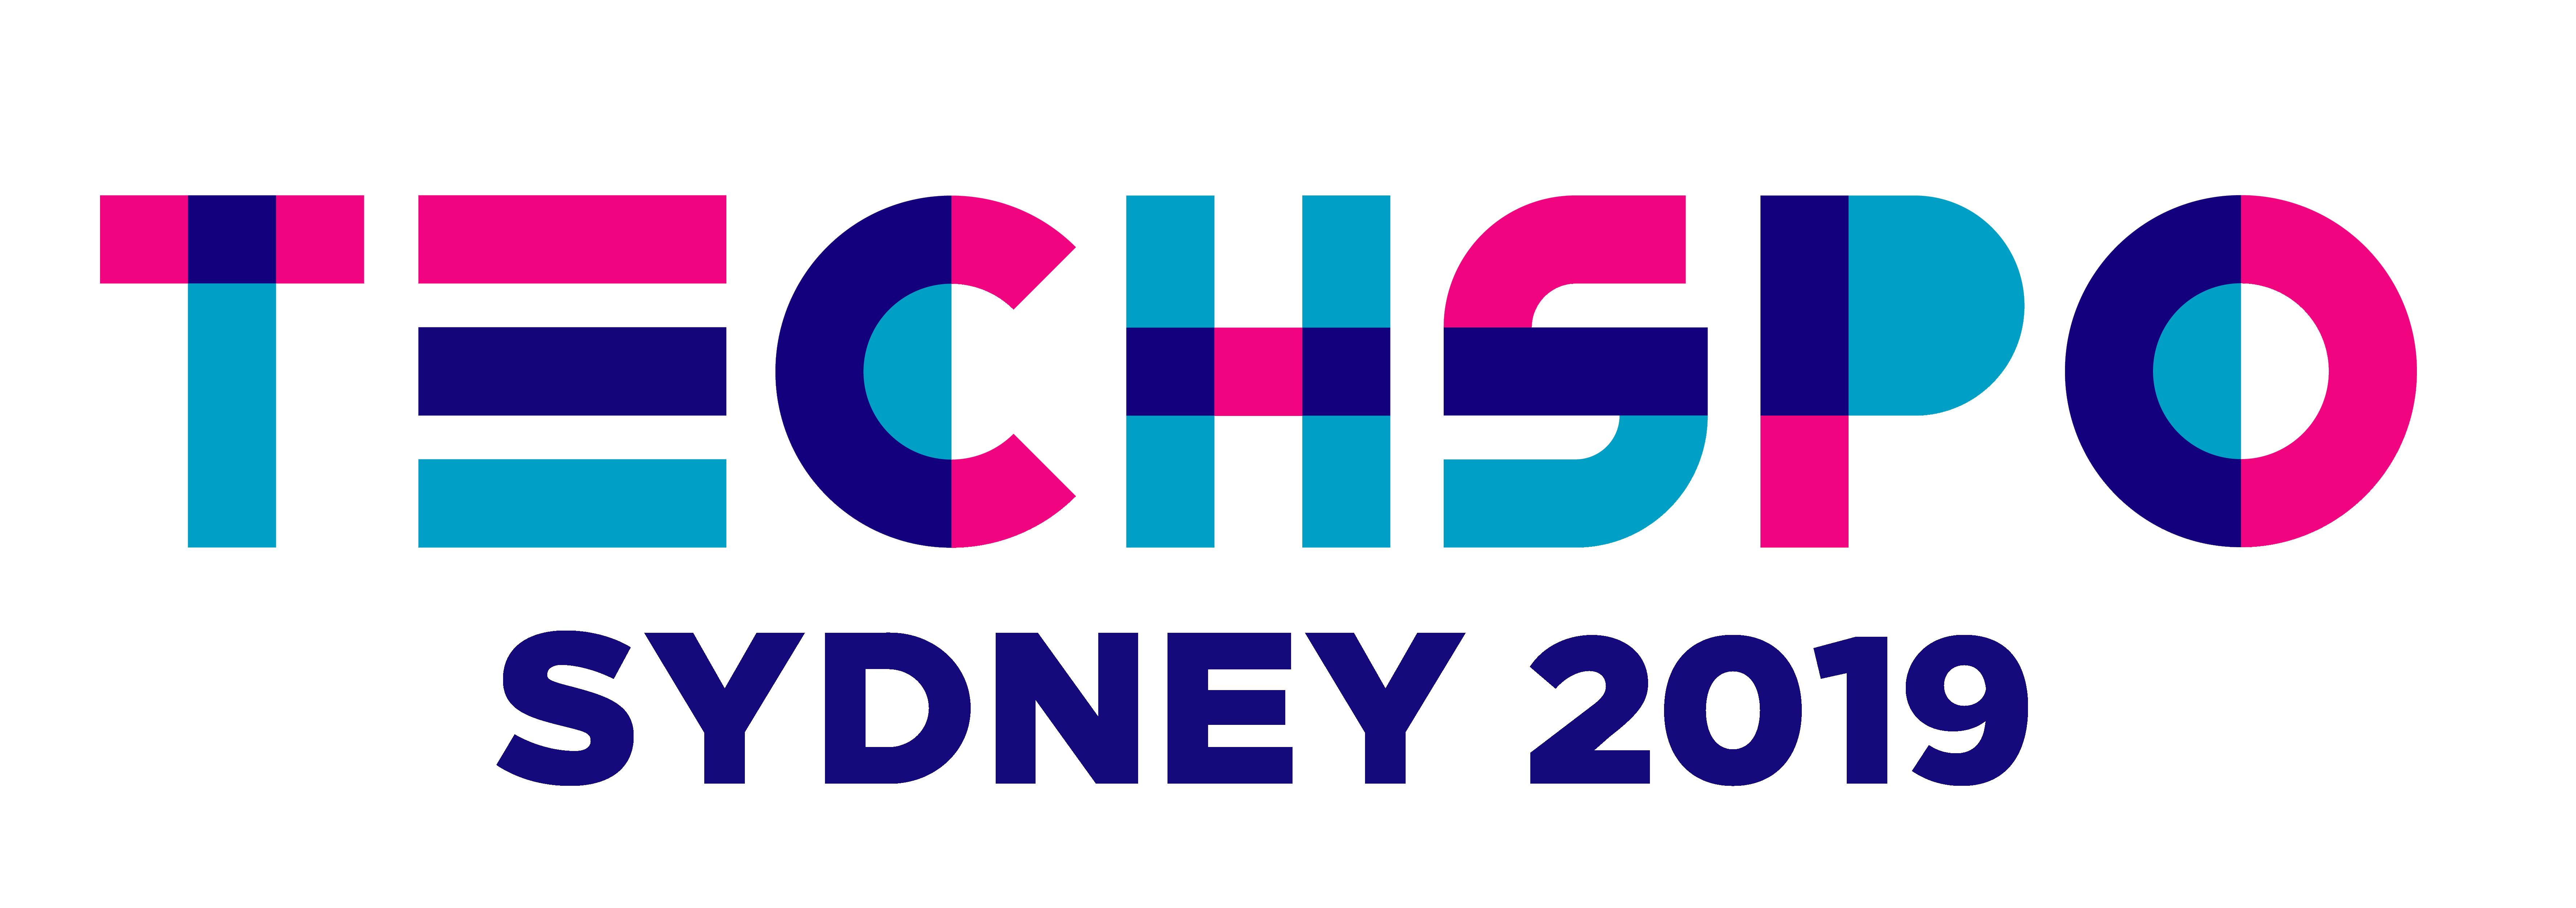 TECHSPO Sydney 2021